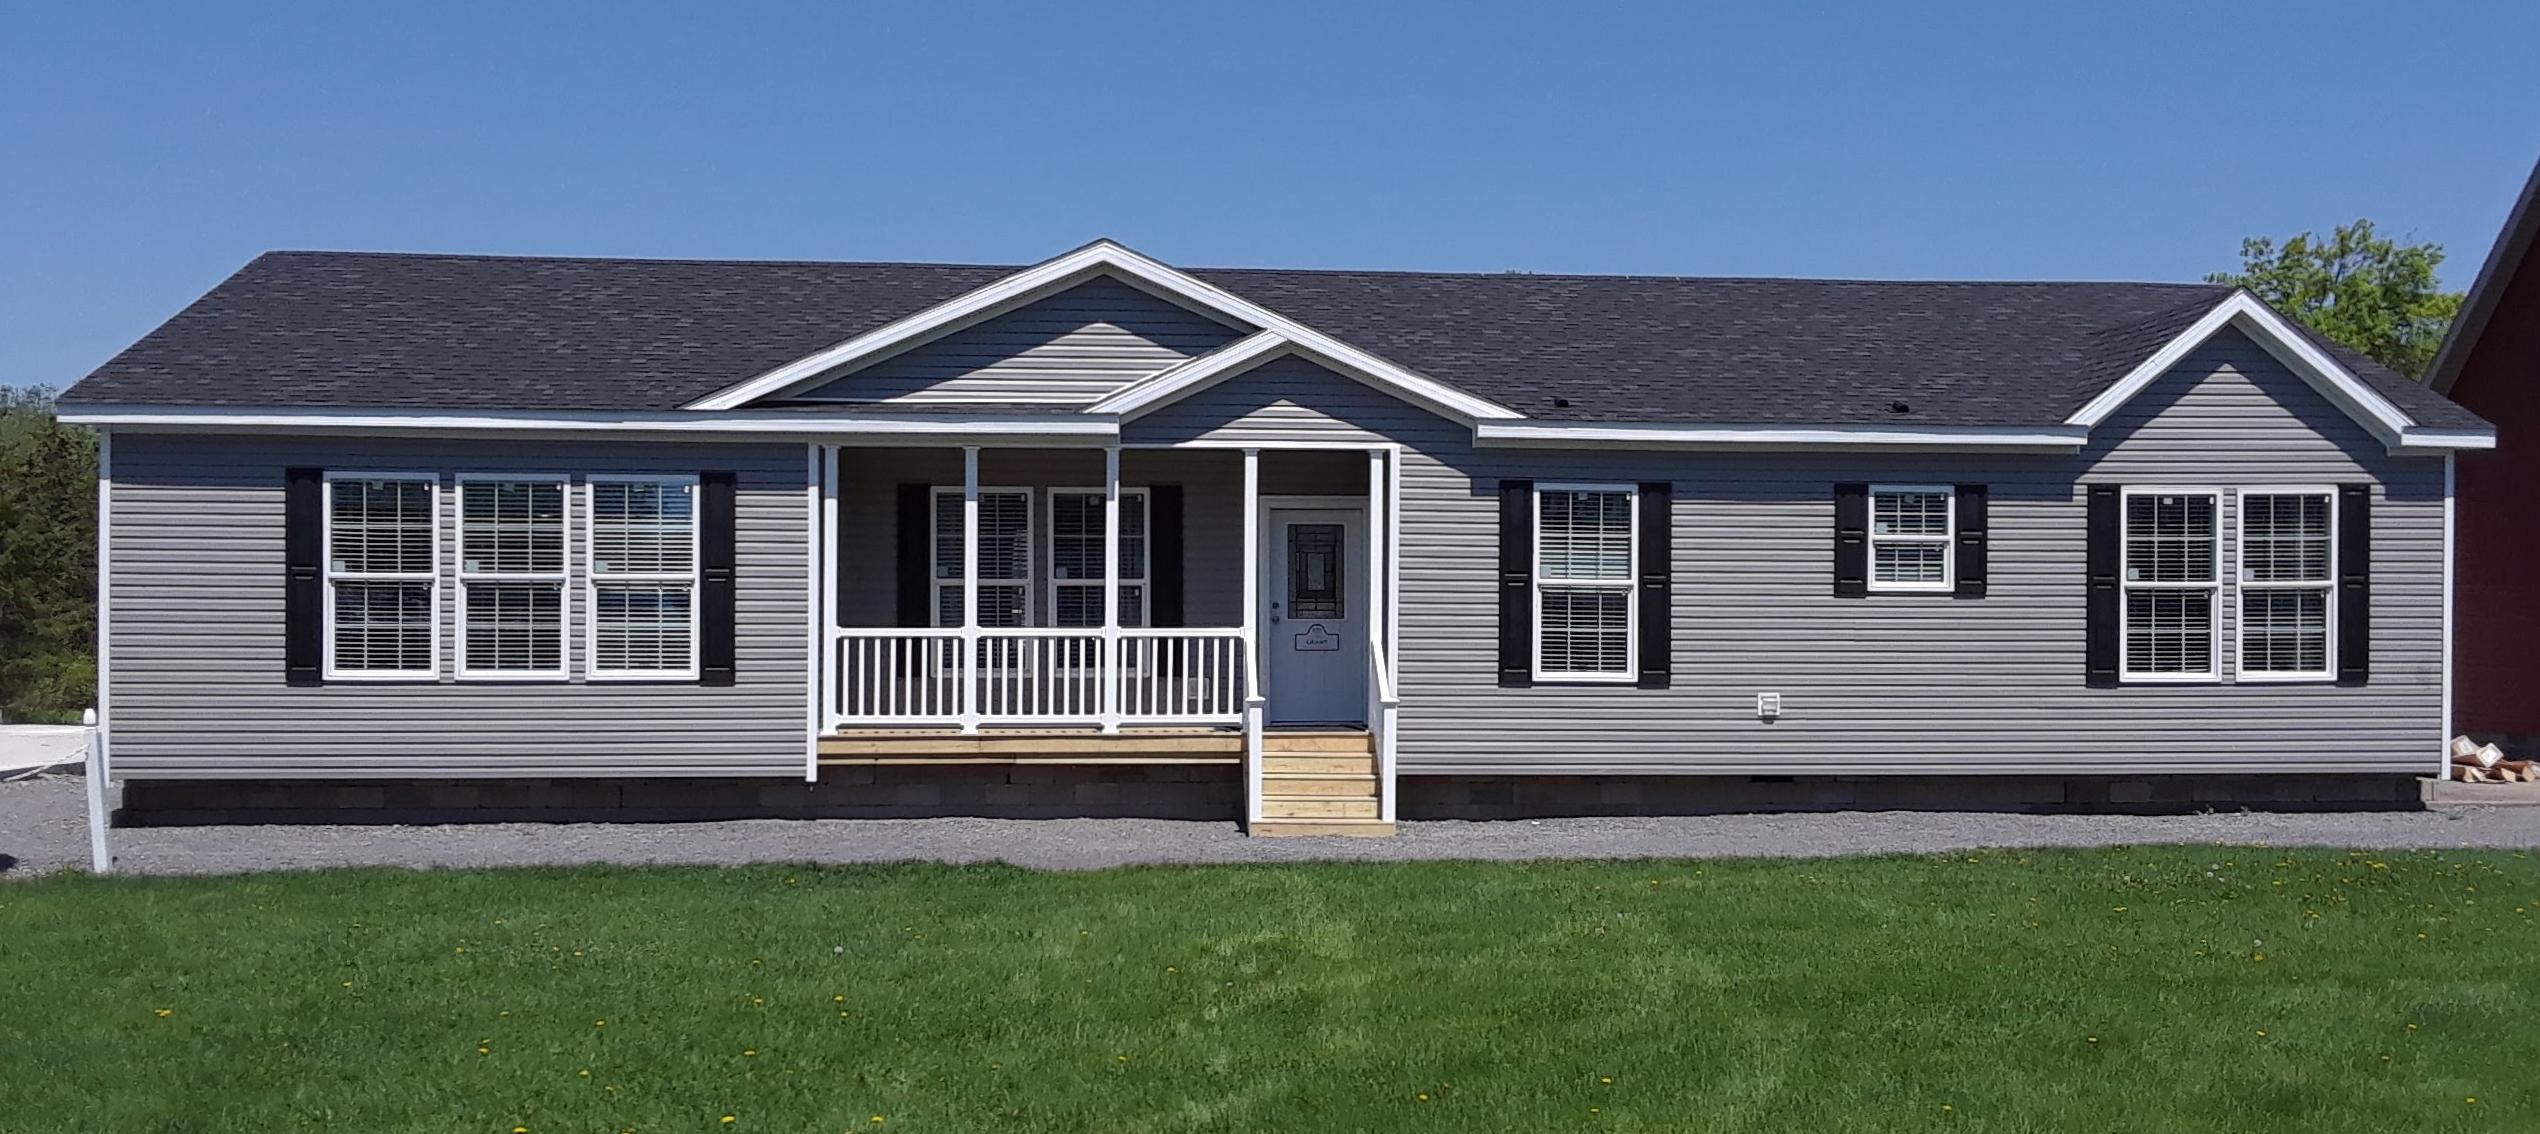 American Homes Syracuse Ny >> Modular Homes For Sale By American Homes In Syracuse